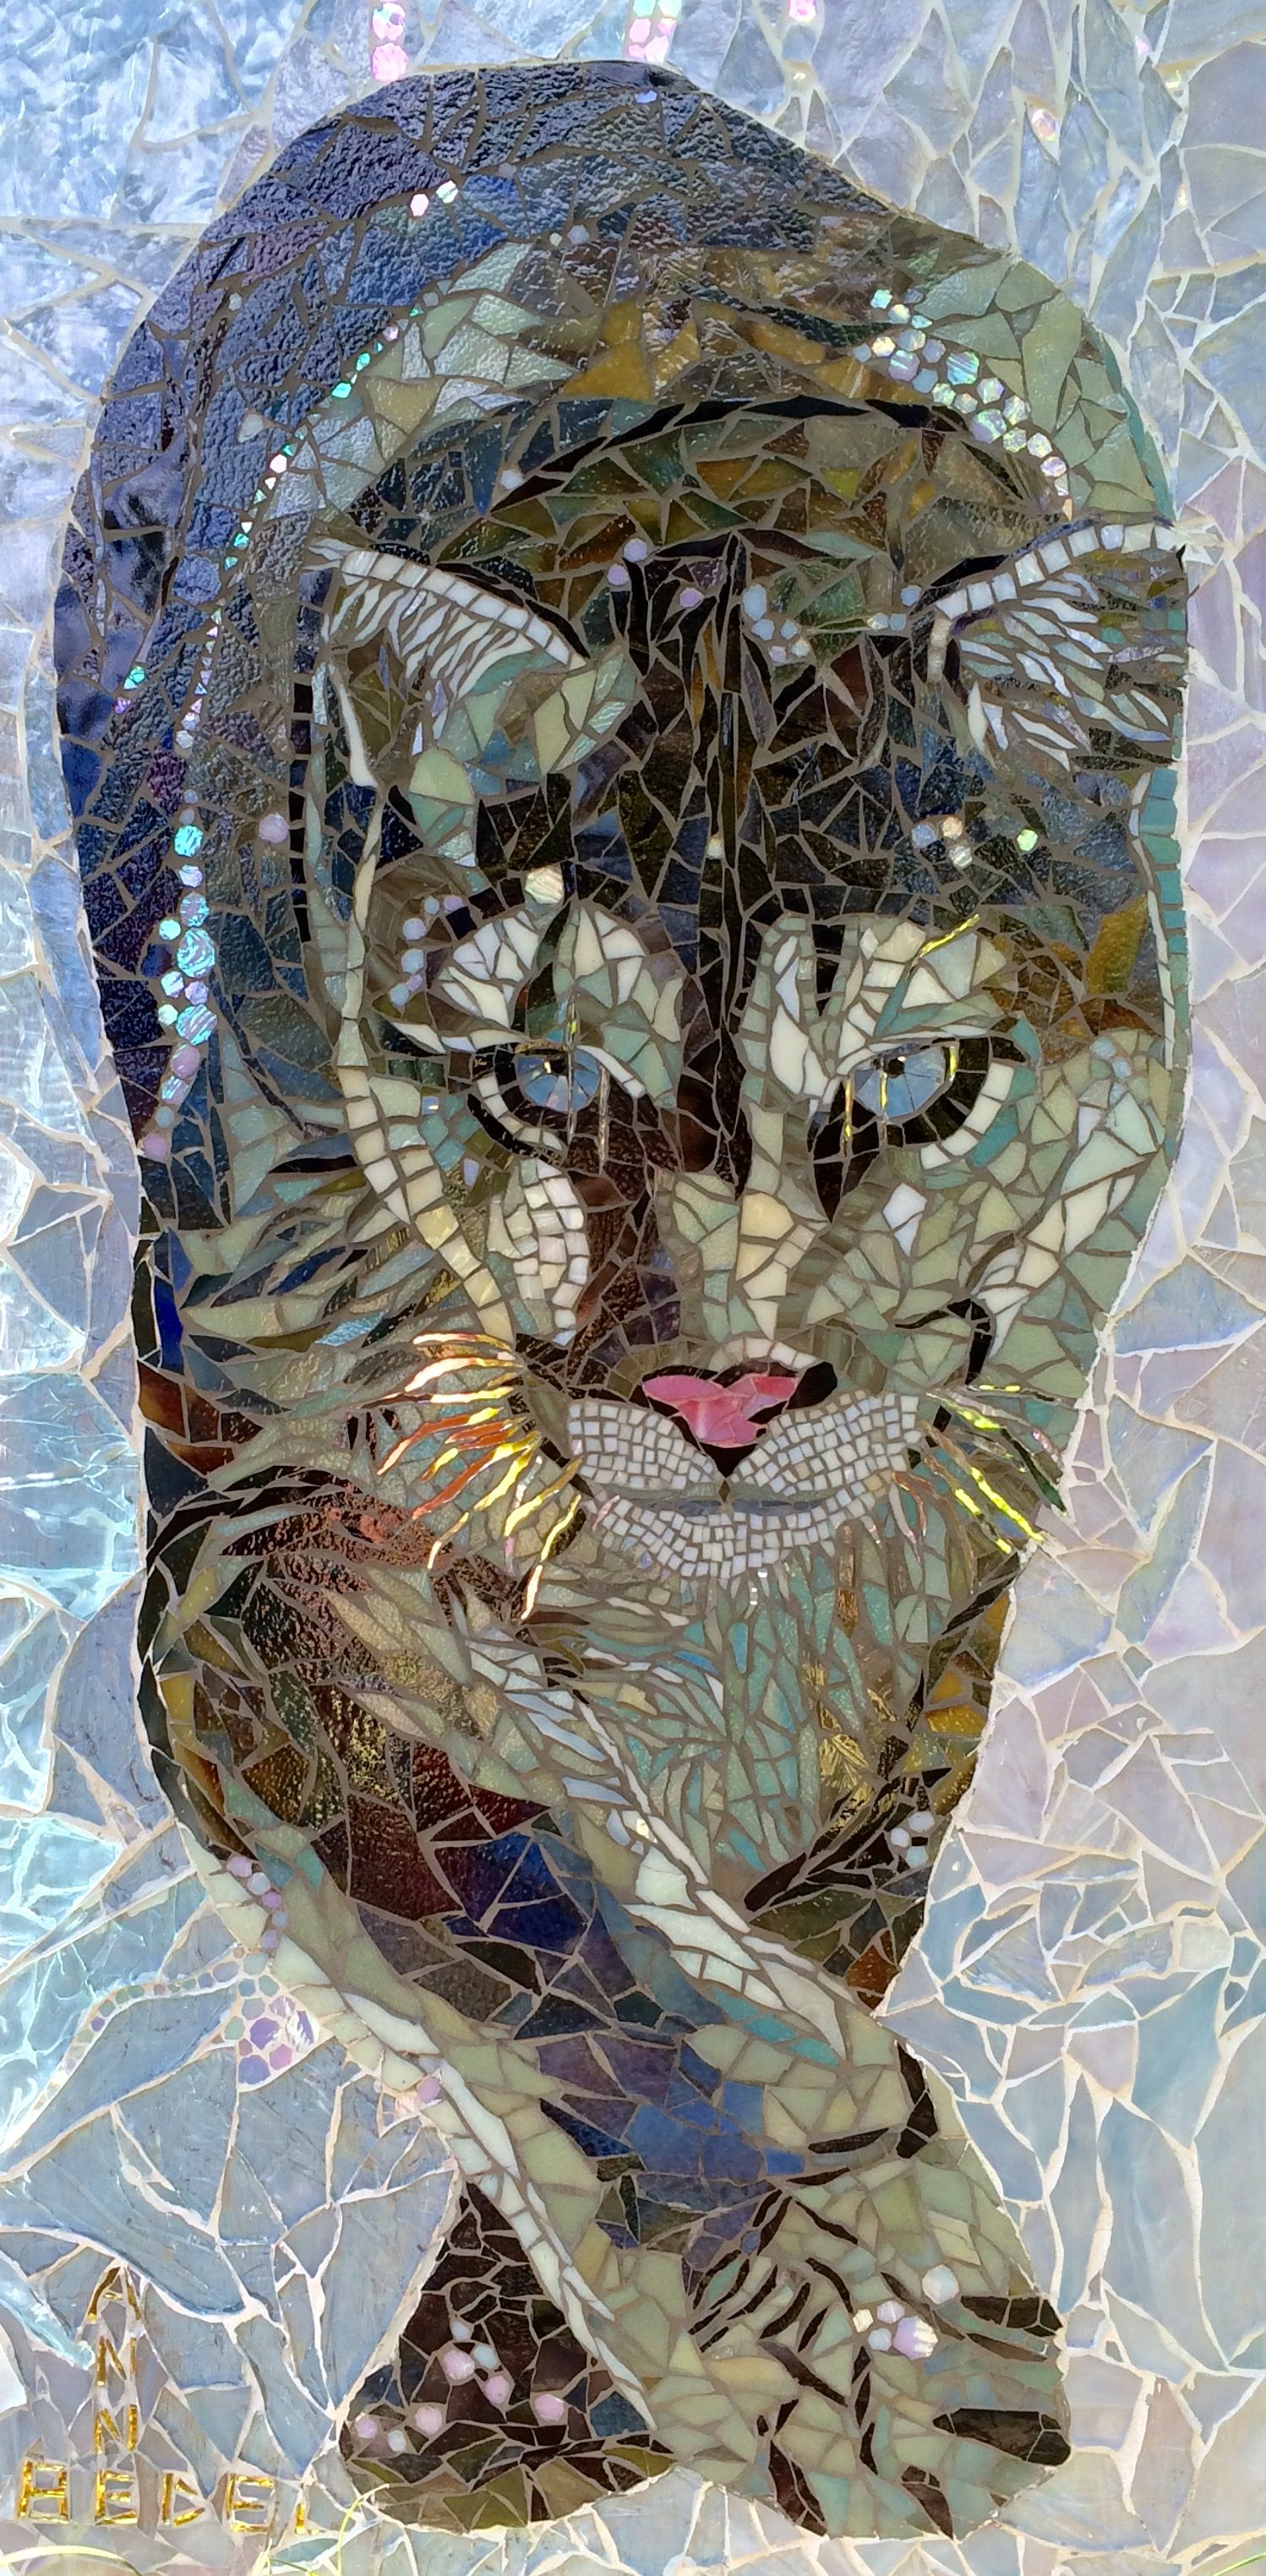 Snow puma mosaic - Anne BEDEL - 2016 | mozajka | Pinterest ...